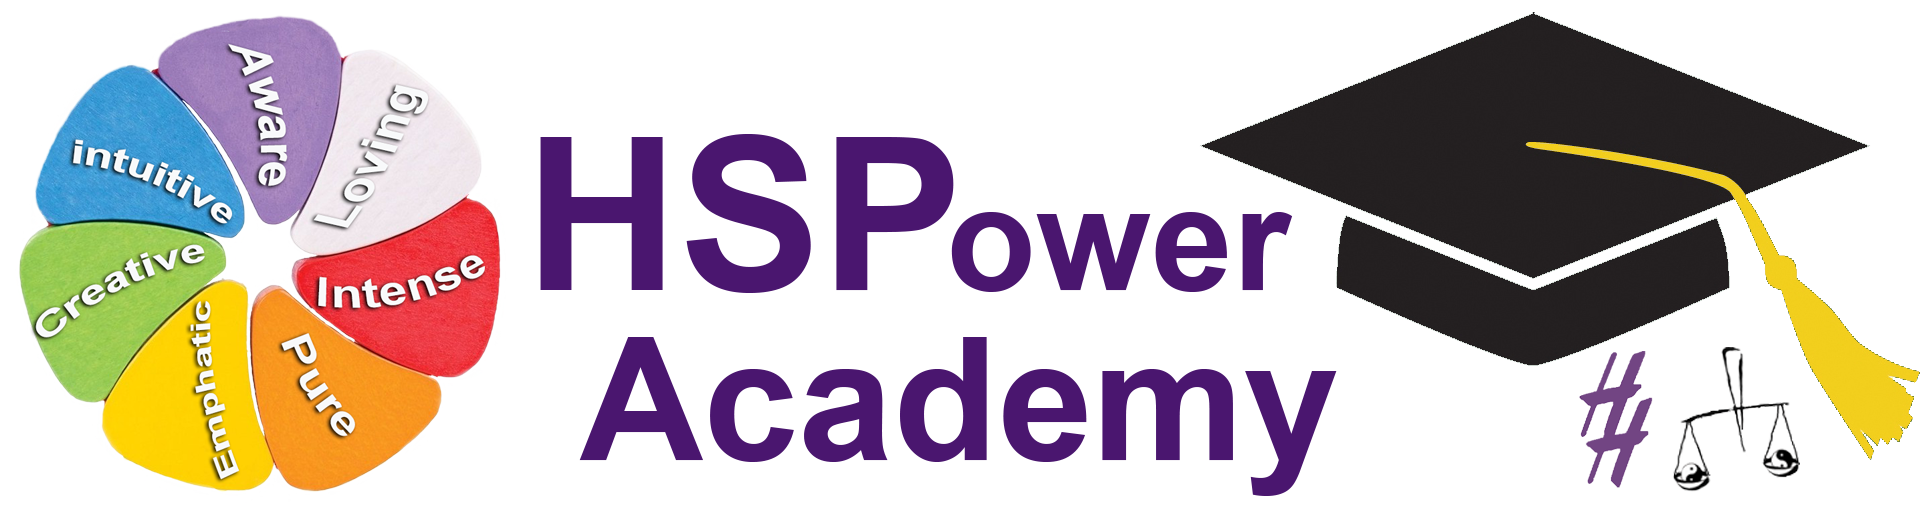 HSPowerAcademy